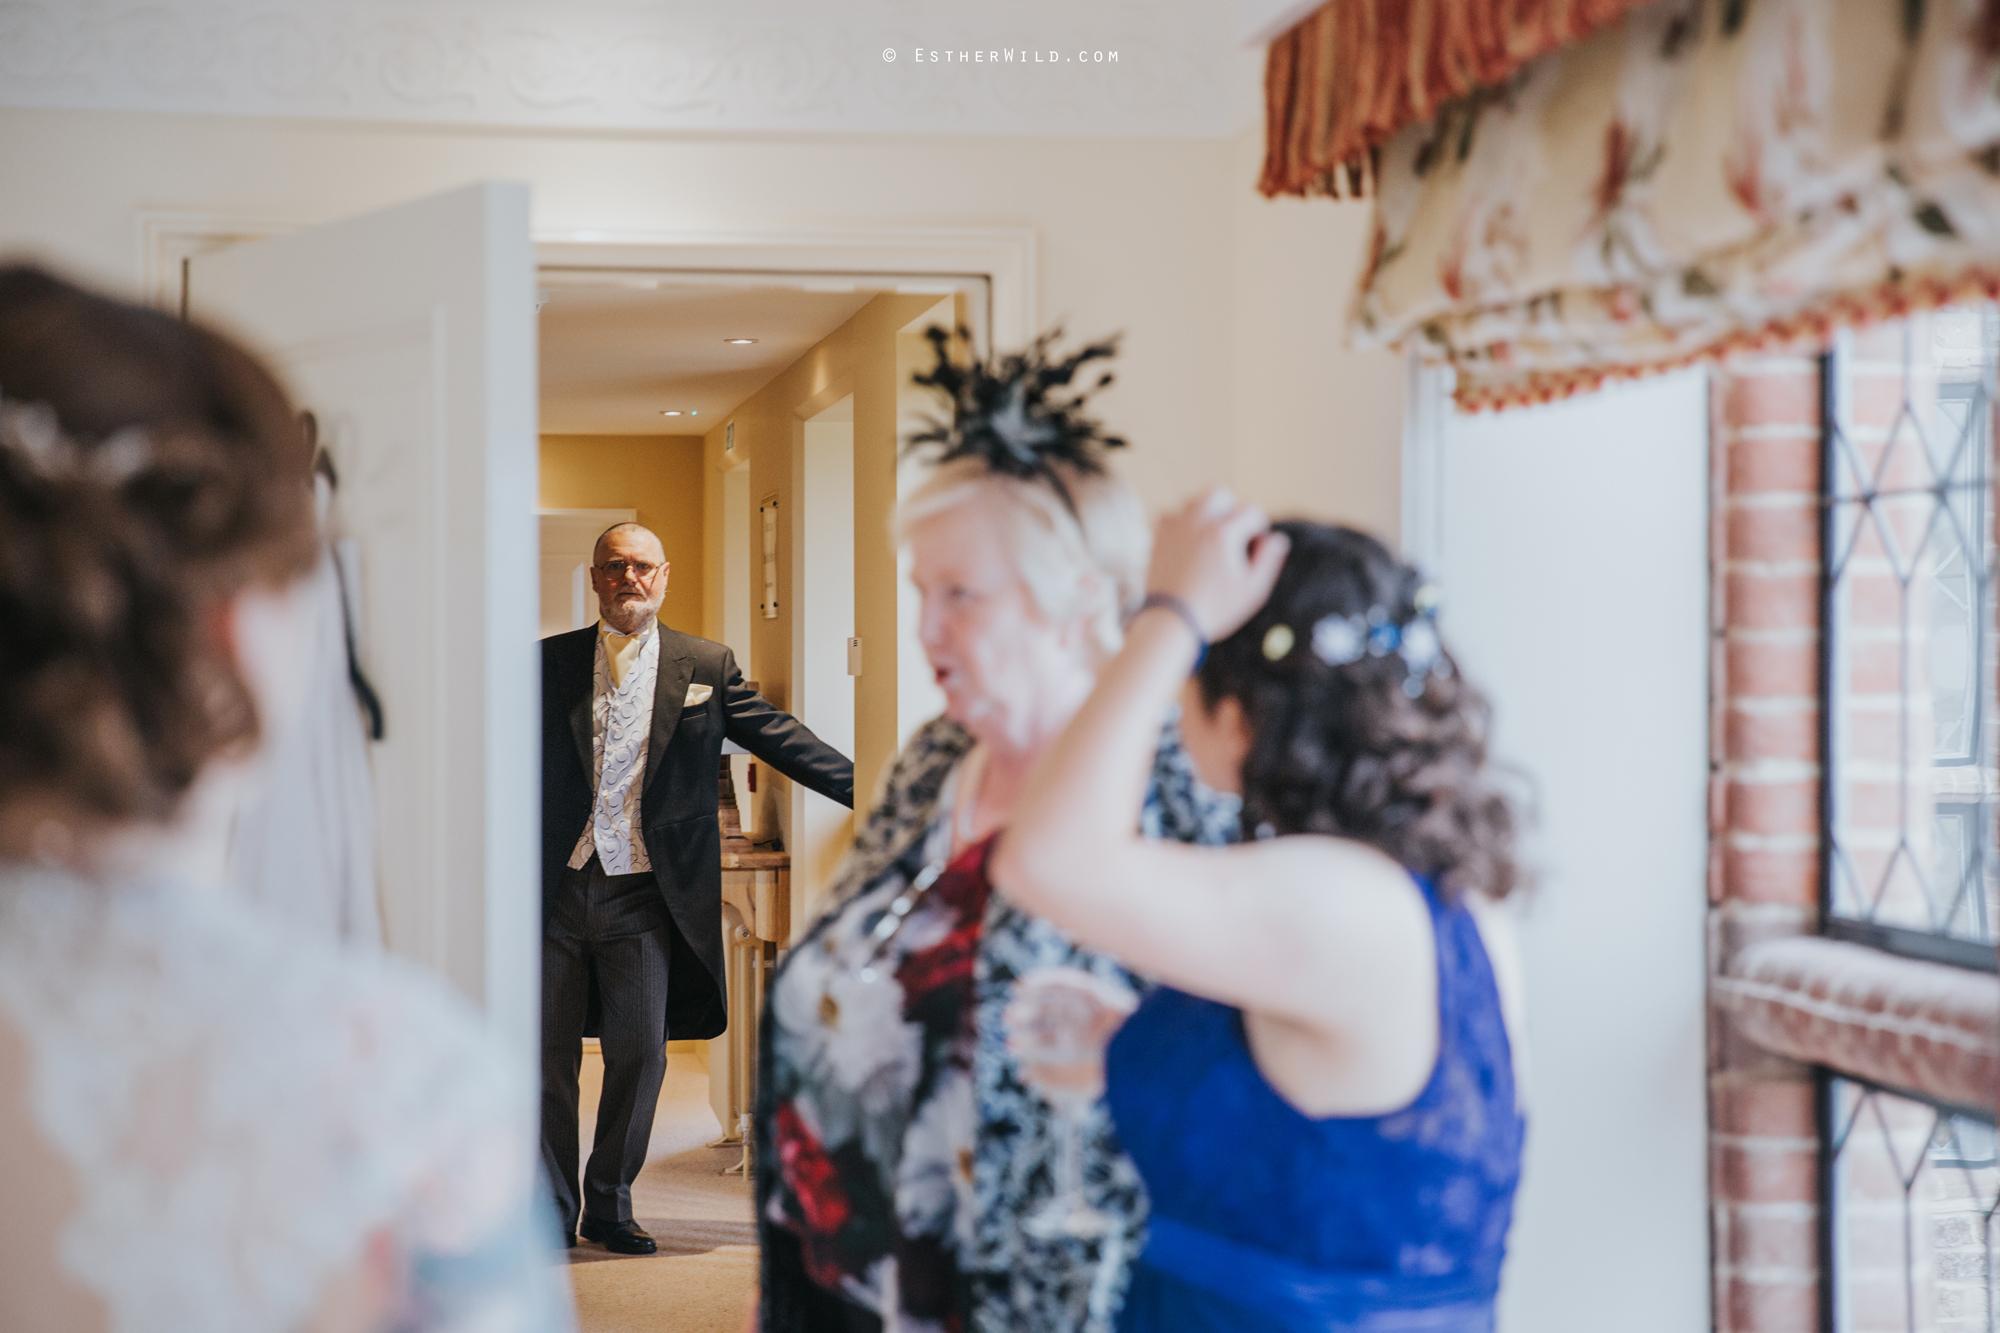 Old_Hall_Ely_Wedding_Esther_Wild_Photographer_IMG_0576.jpg